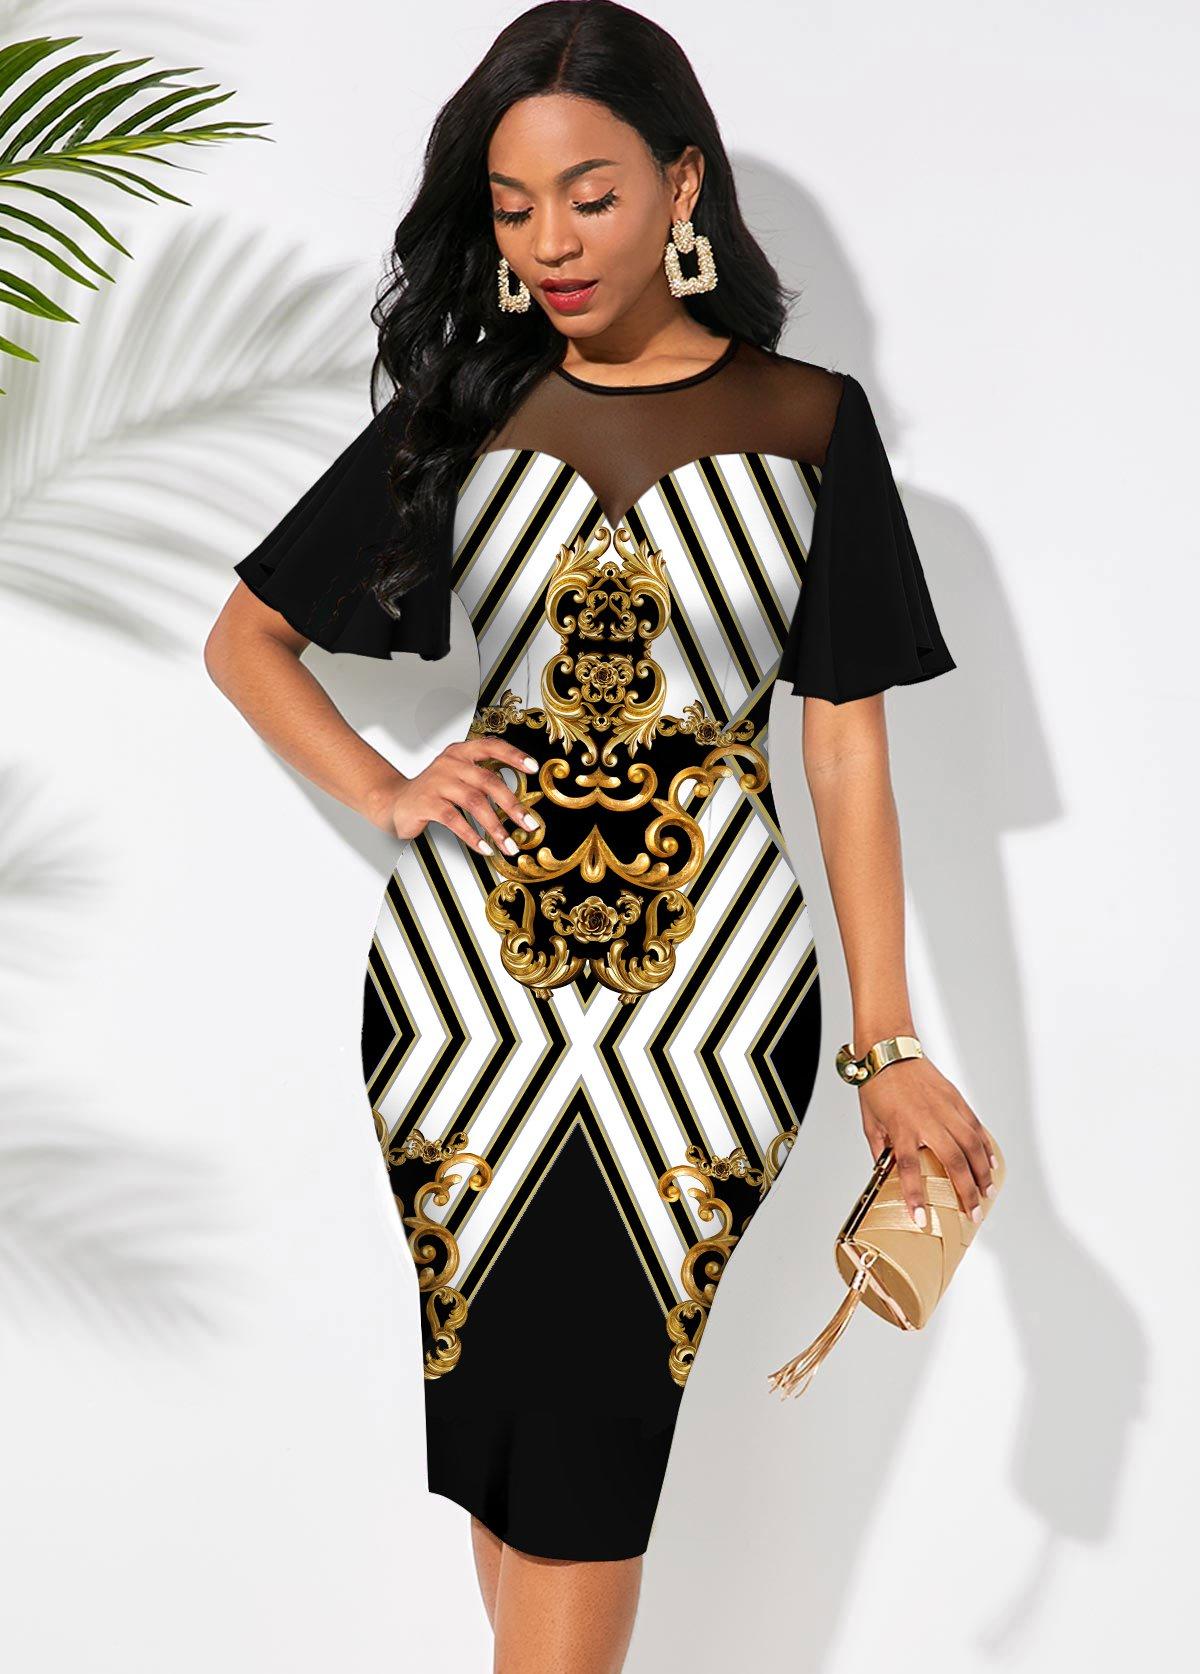 ROTITA Mesh Stitching Baroque Print Short Sleeve Dress